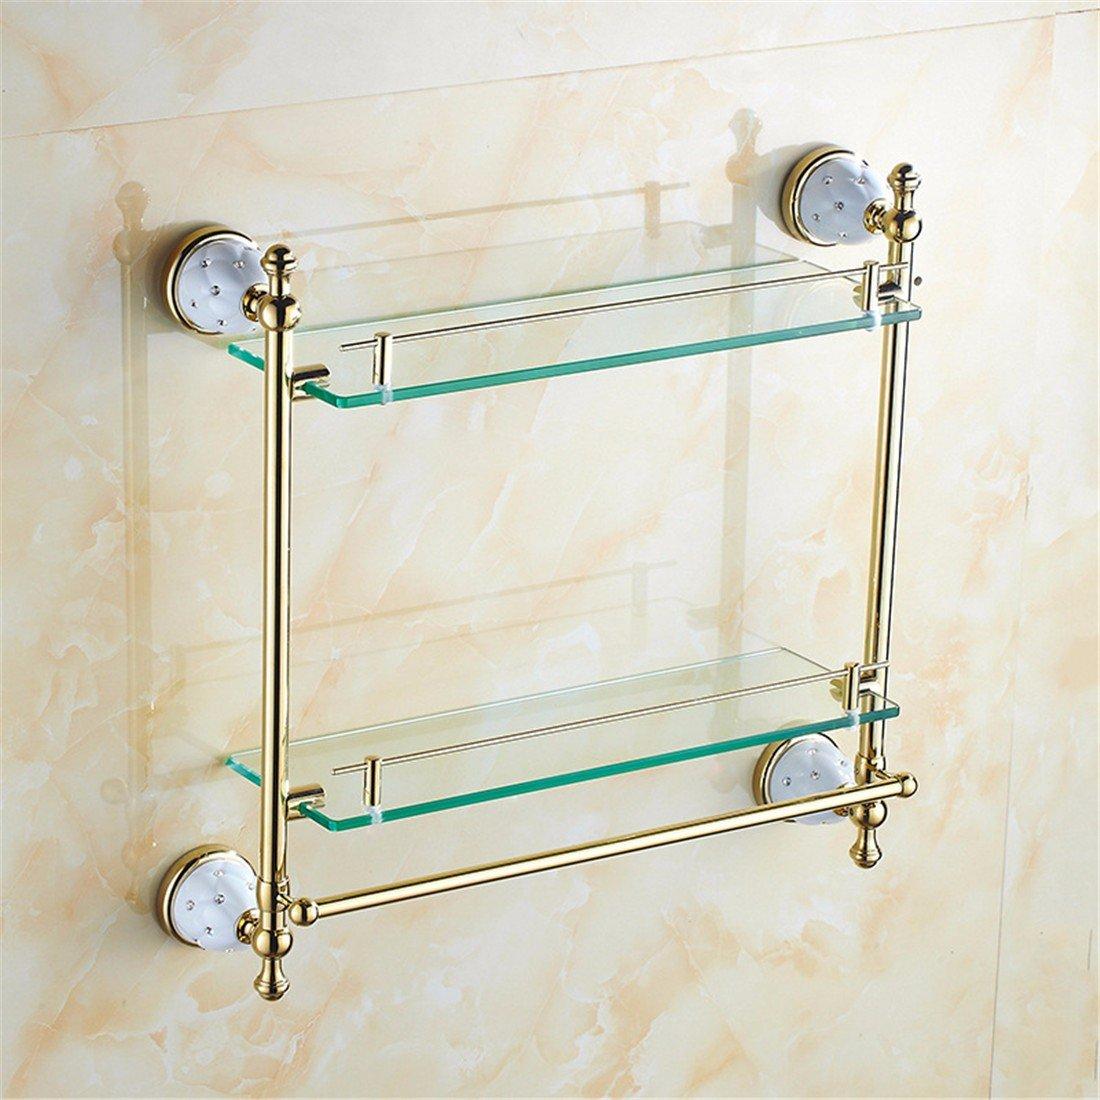 LAONA European golden DIAMOND ANTIQUE bathroom accessories set stainless steel soap box single and double rod,Rack 2